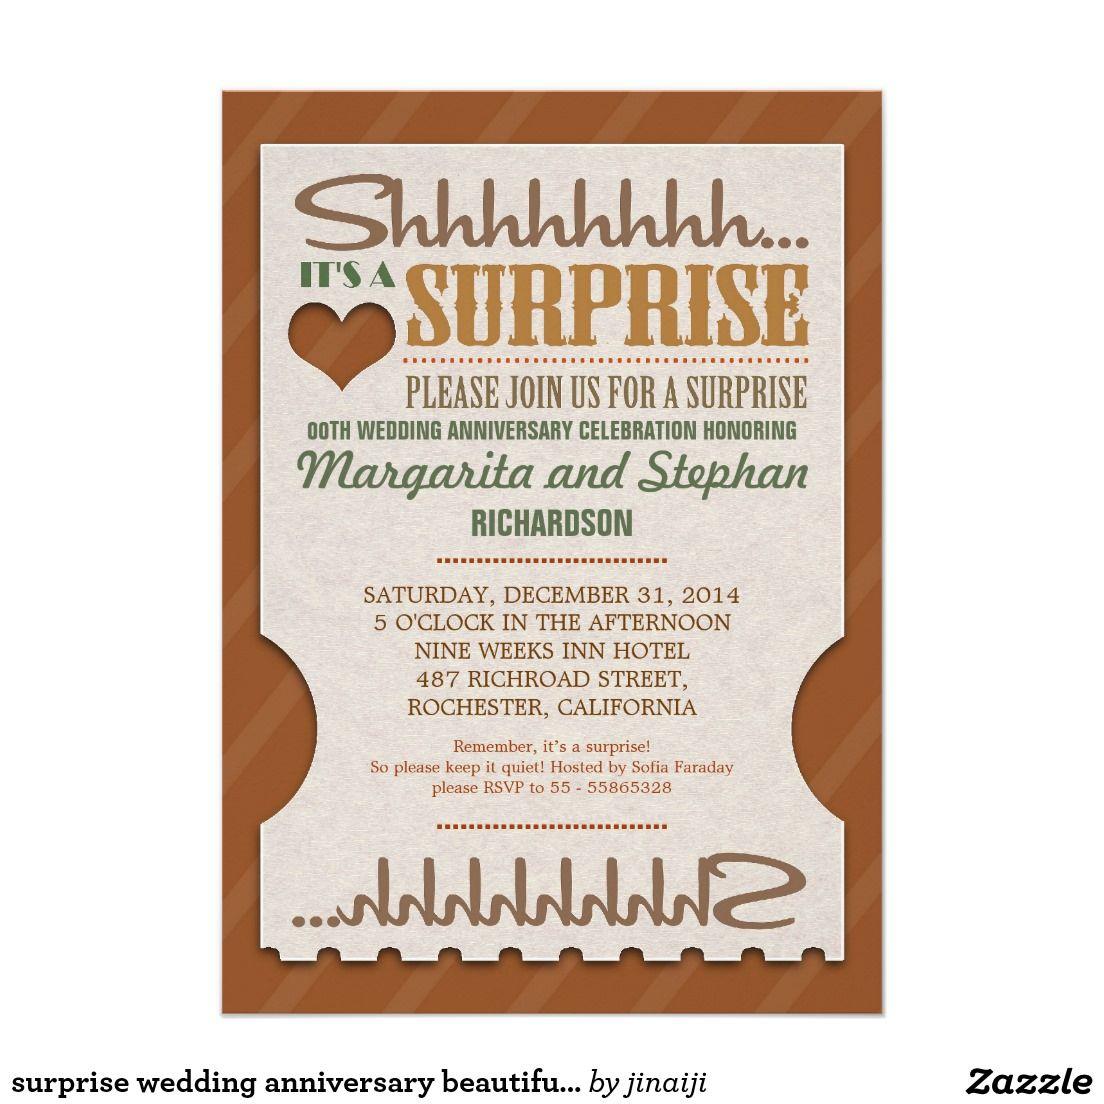 Surprise wedding anniversary beautiful invitations   Wedding Elegant ...